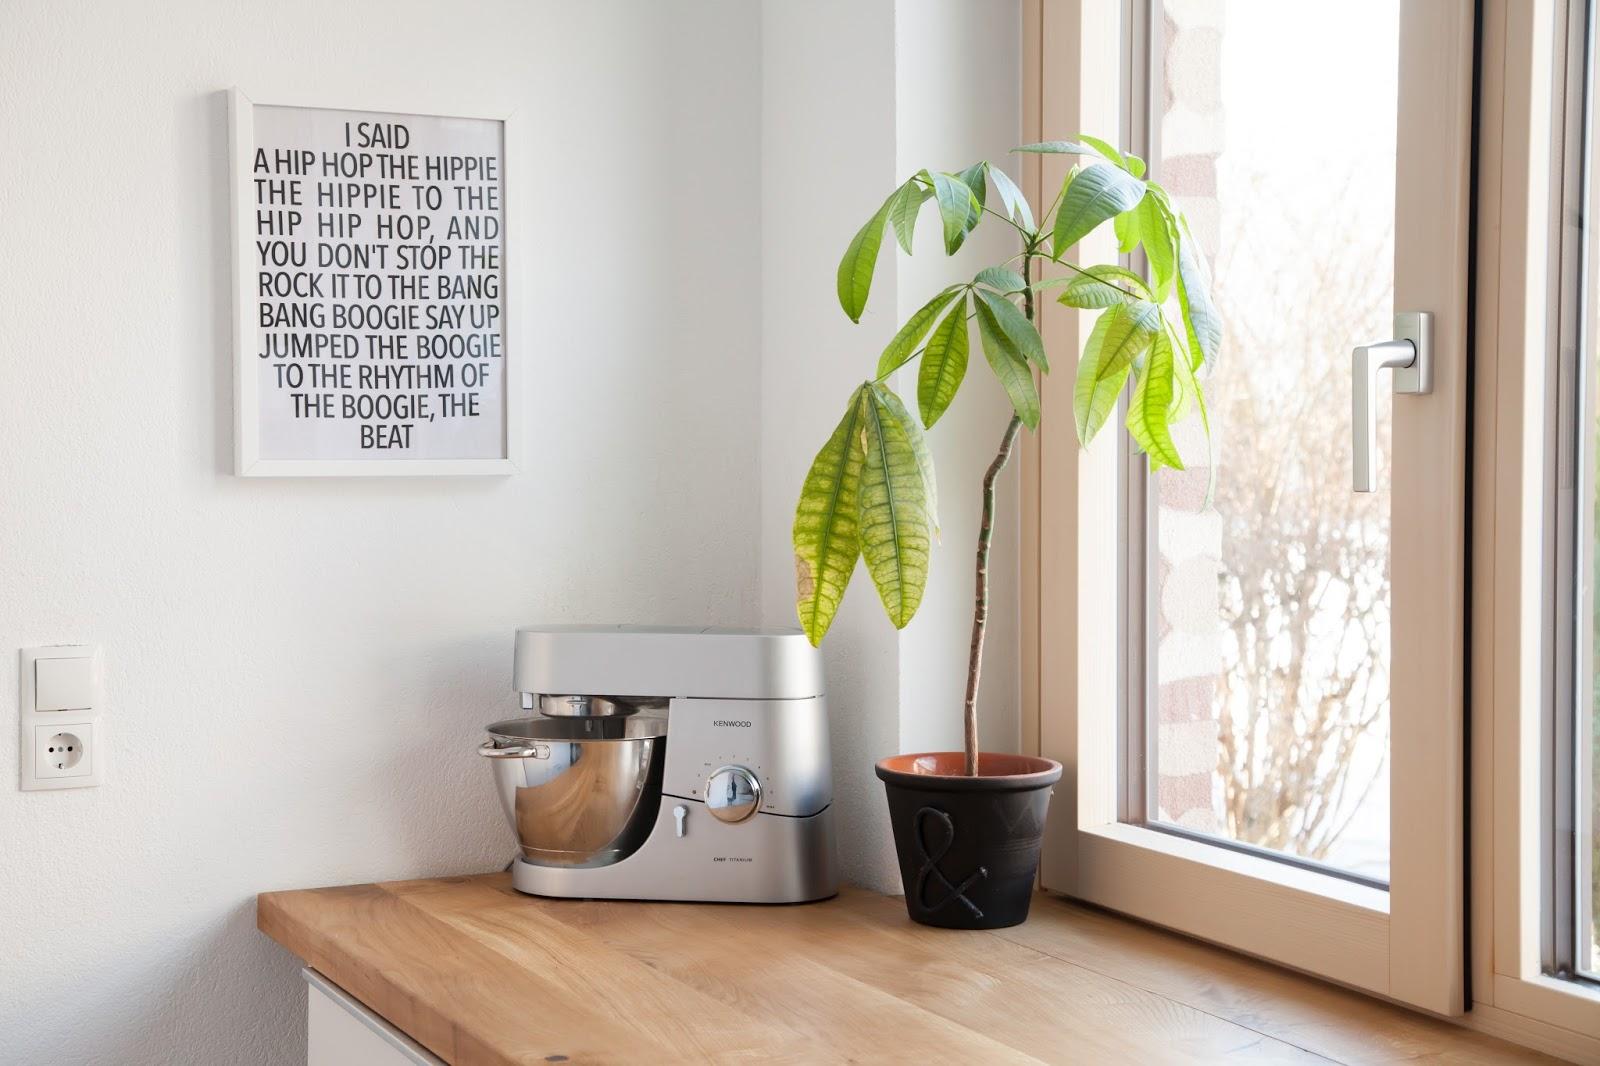 februar 2016 wohn projekt der mama tochter blog f r interior diy lifestyle und kreatives. Black Bedroom Furniture Sets. Home Design Ideas